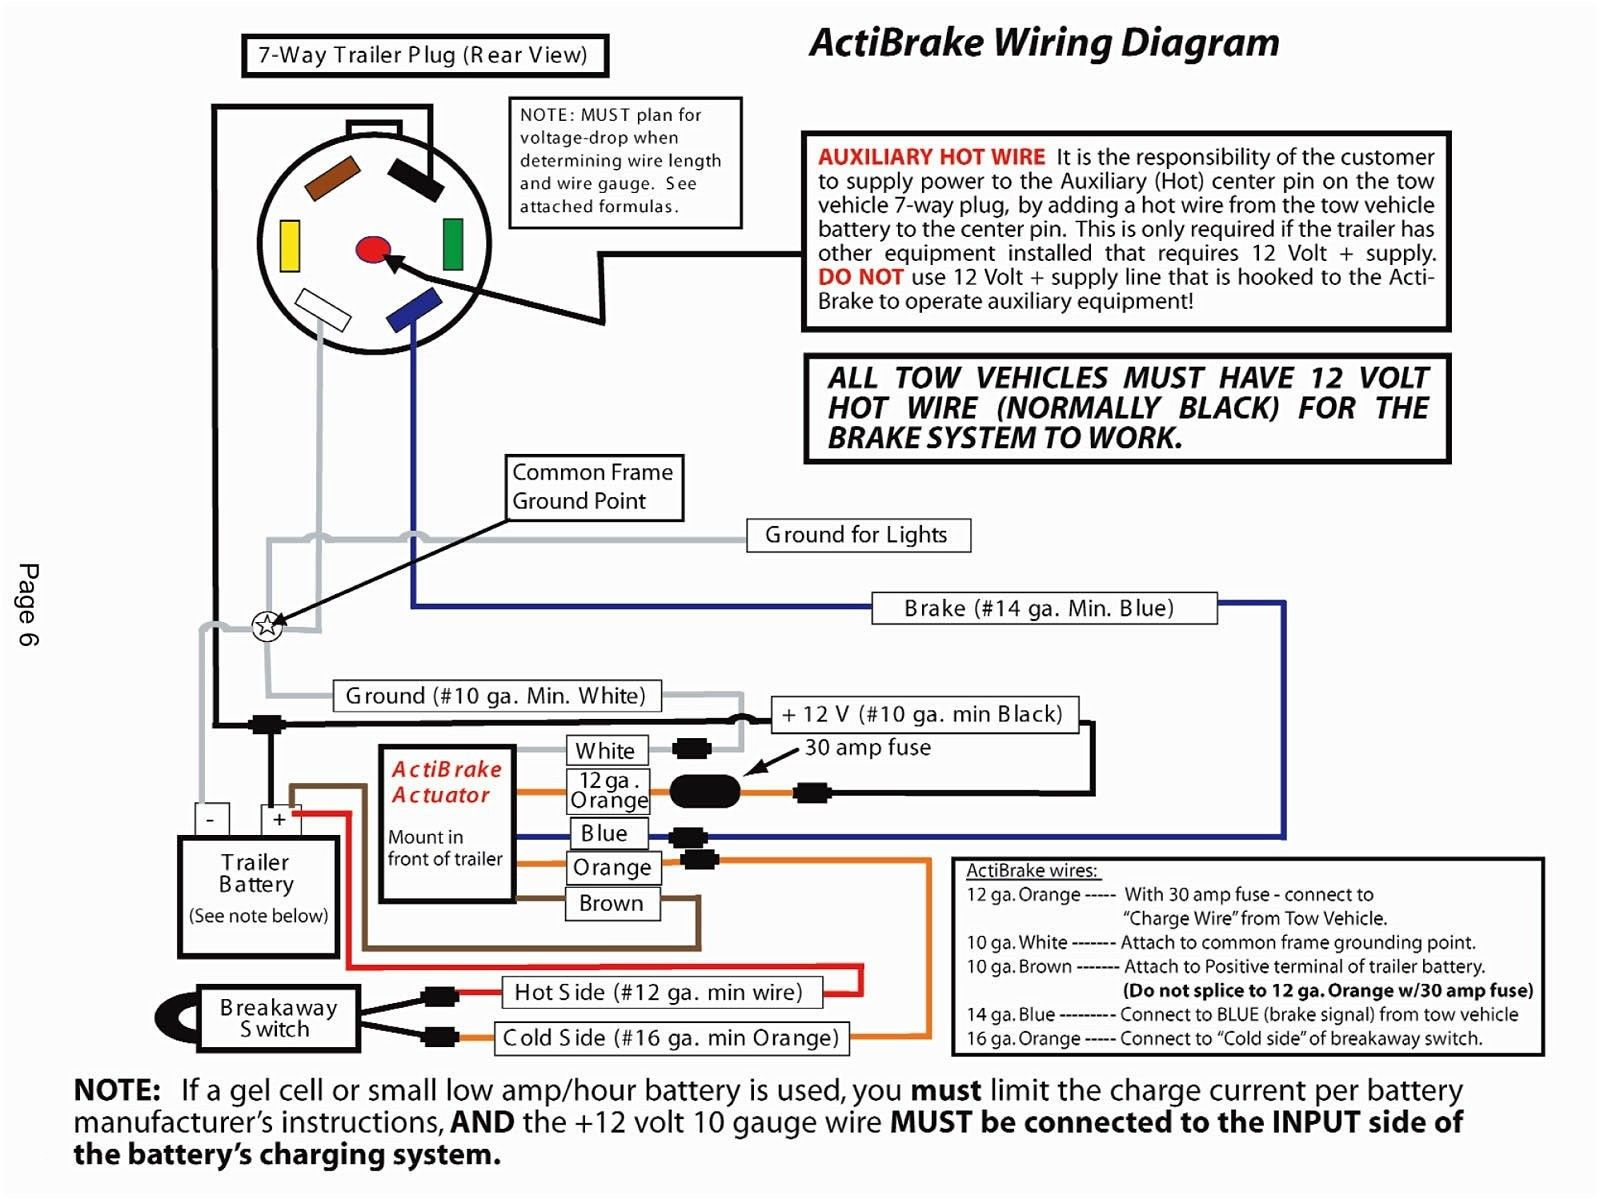 Ford Trailer Wiring Diagram 7 Way In 2020 Trailer Wiring Diagram Diagram Trailer Light Wiring